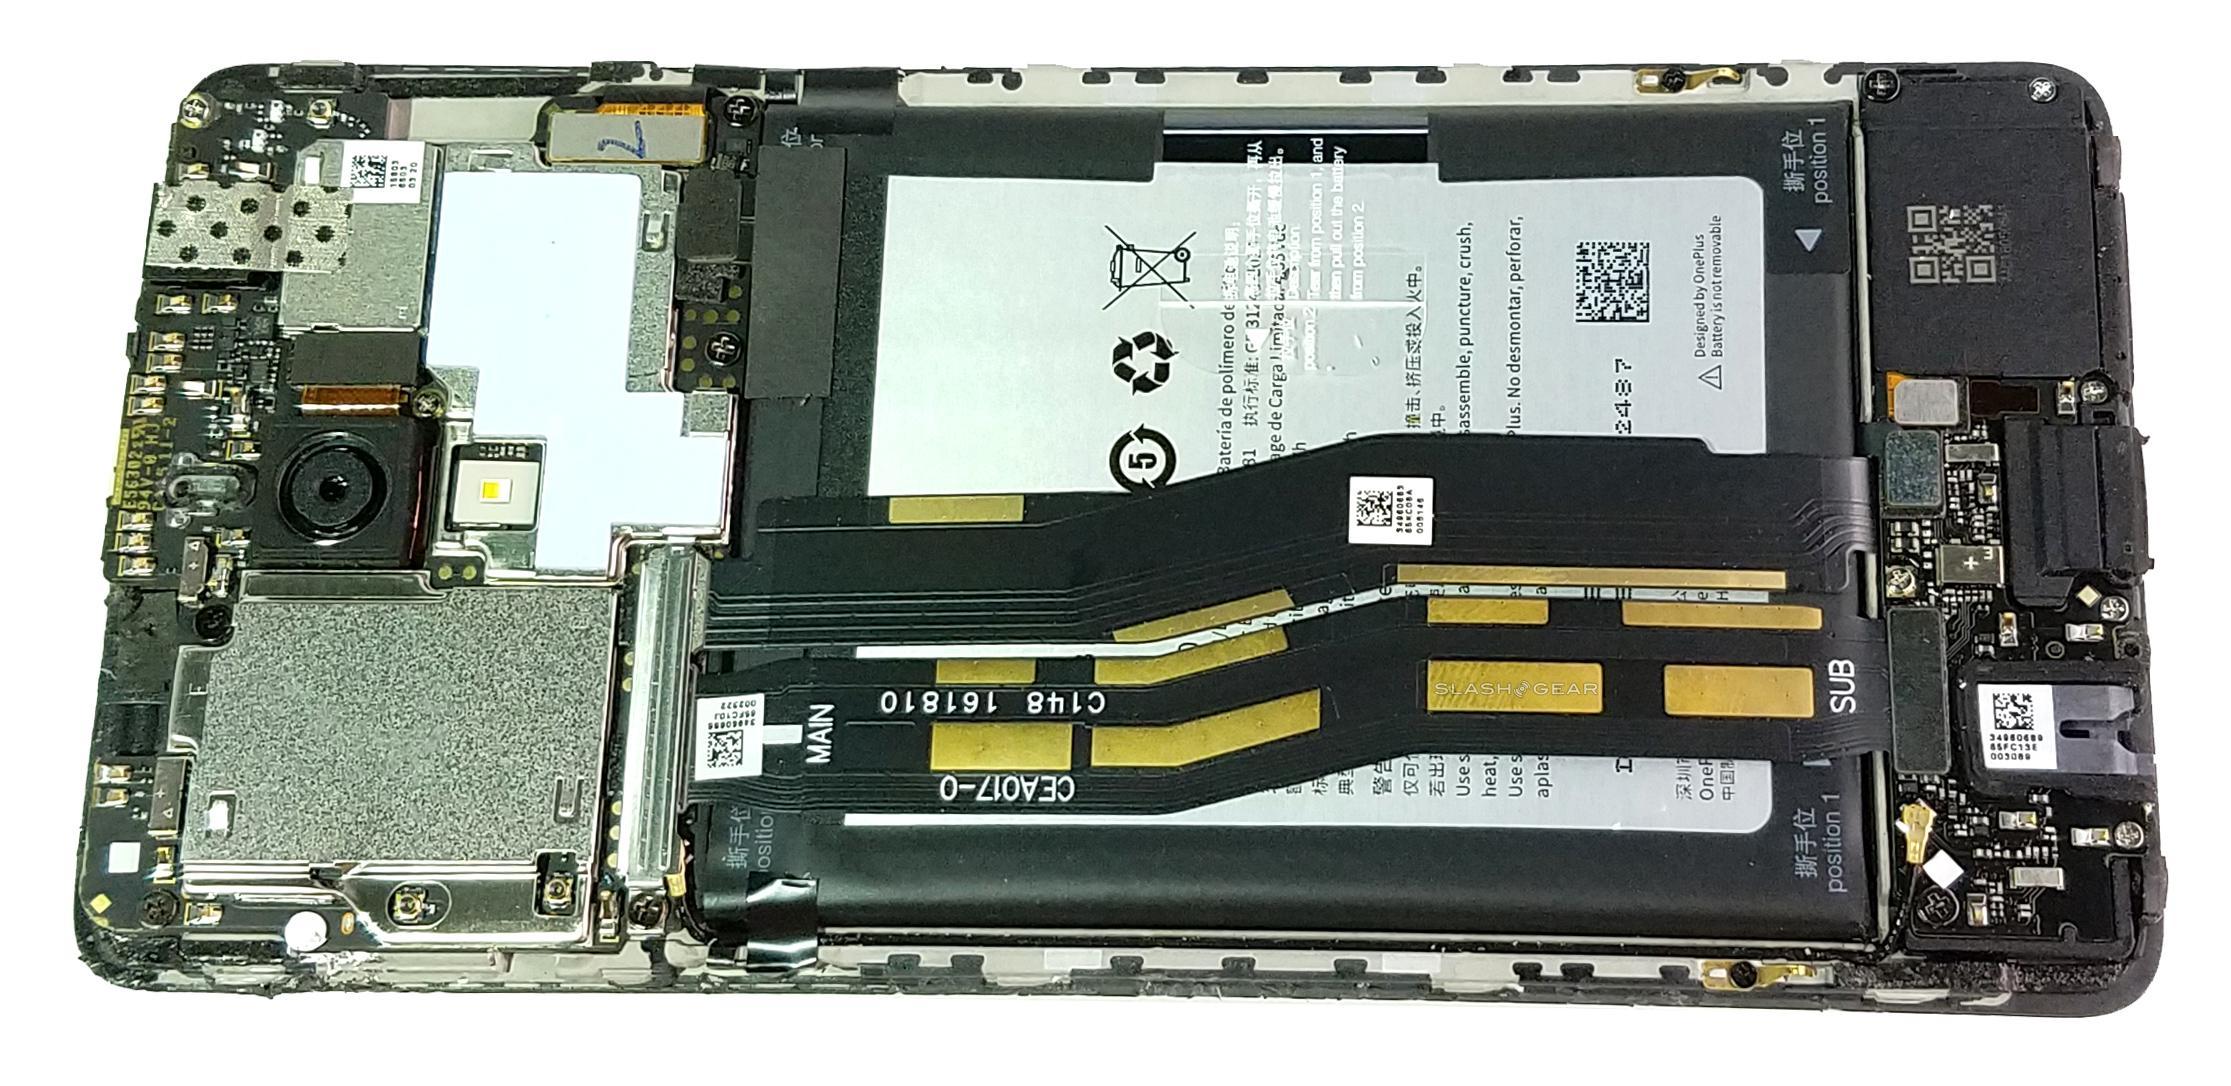 OnePlus 3 Teardown Part I: Battery Replacement - SlashGear